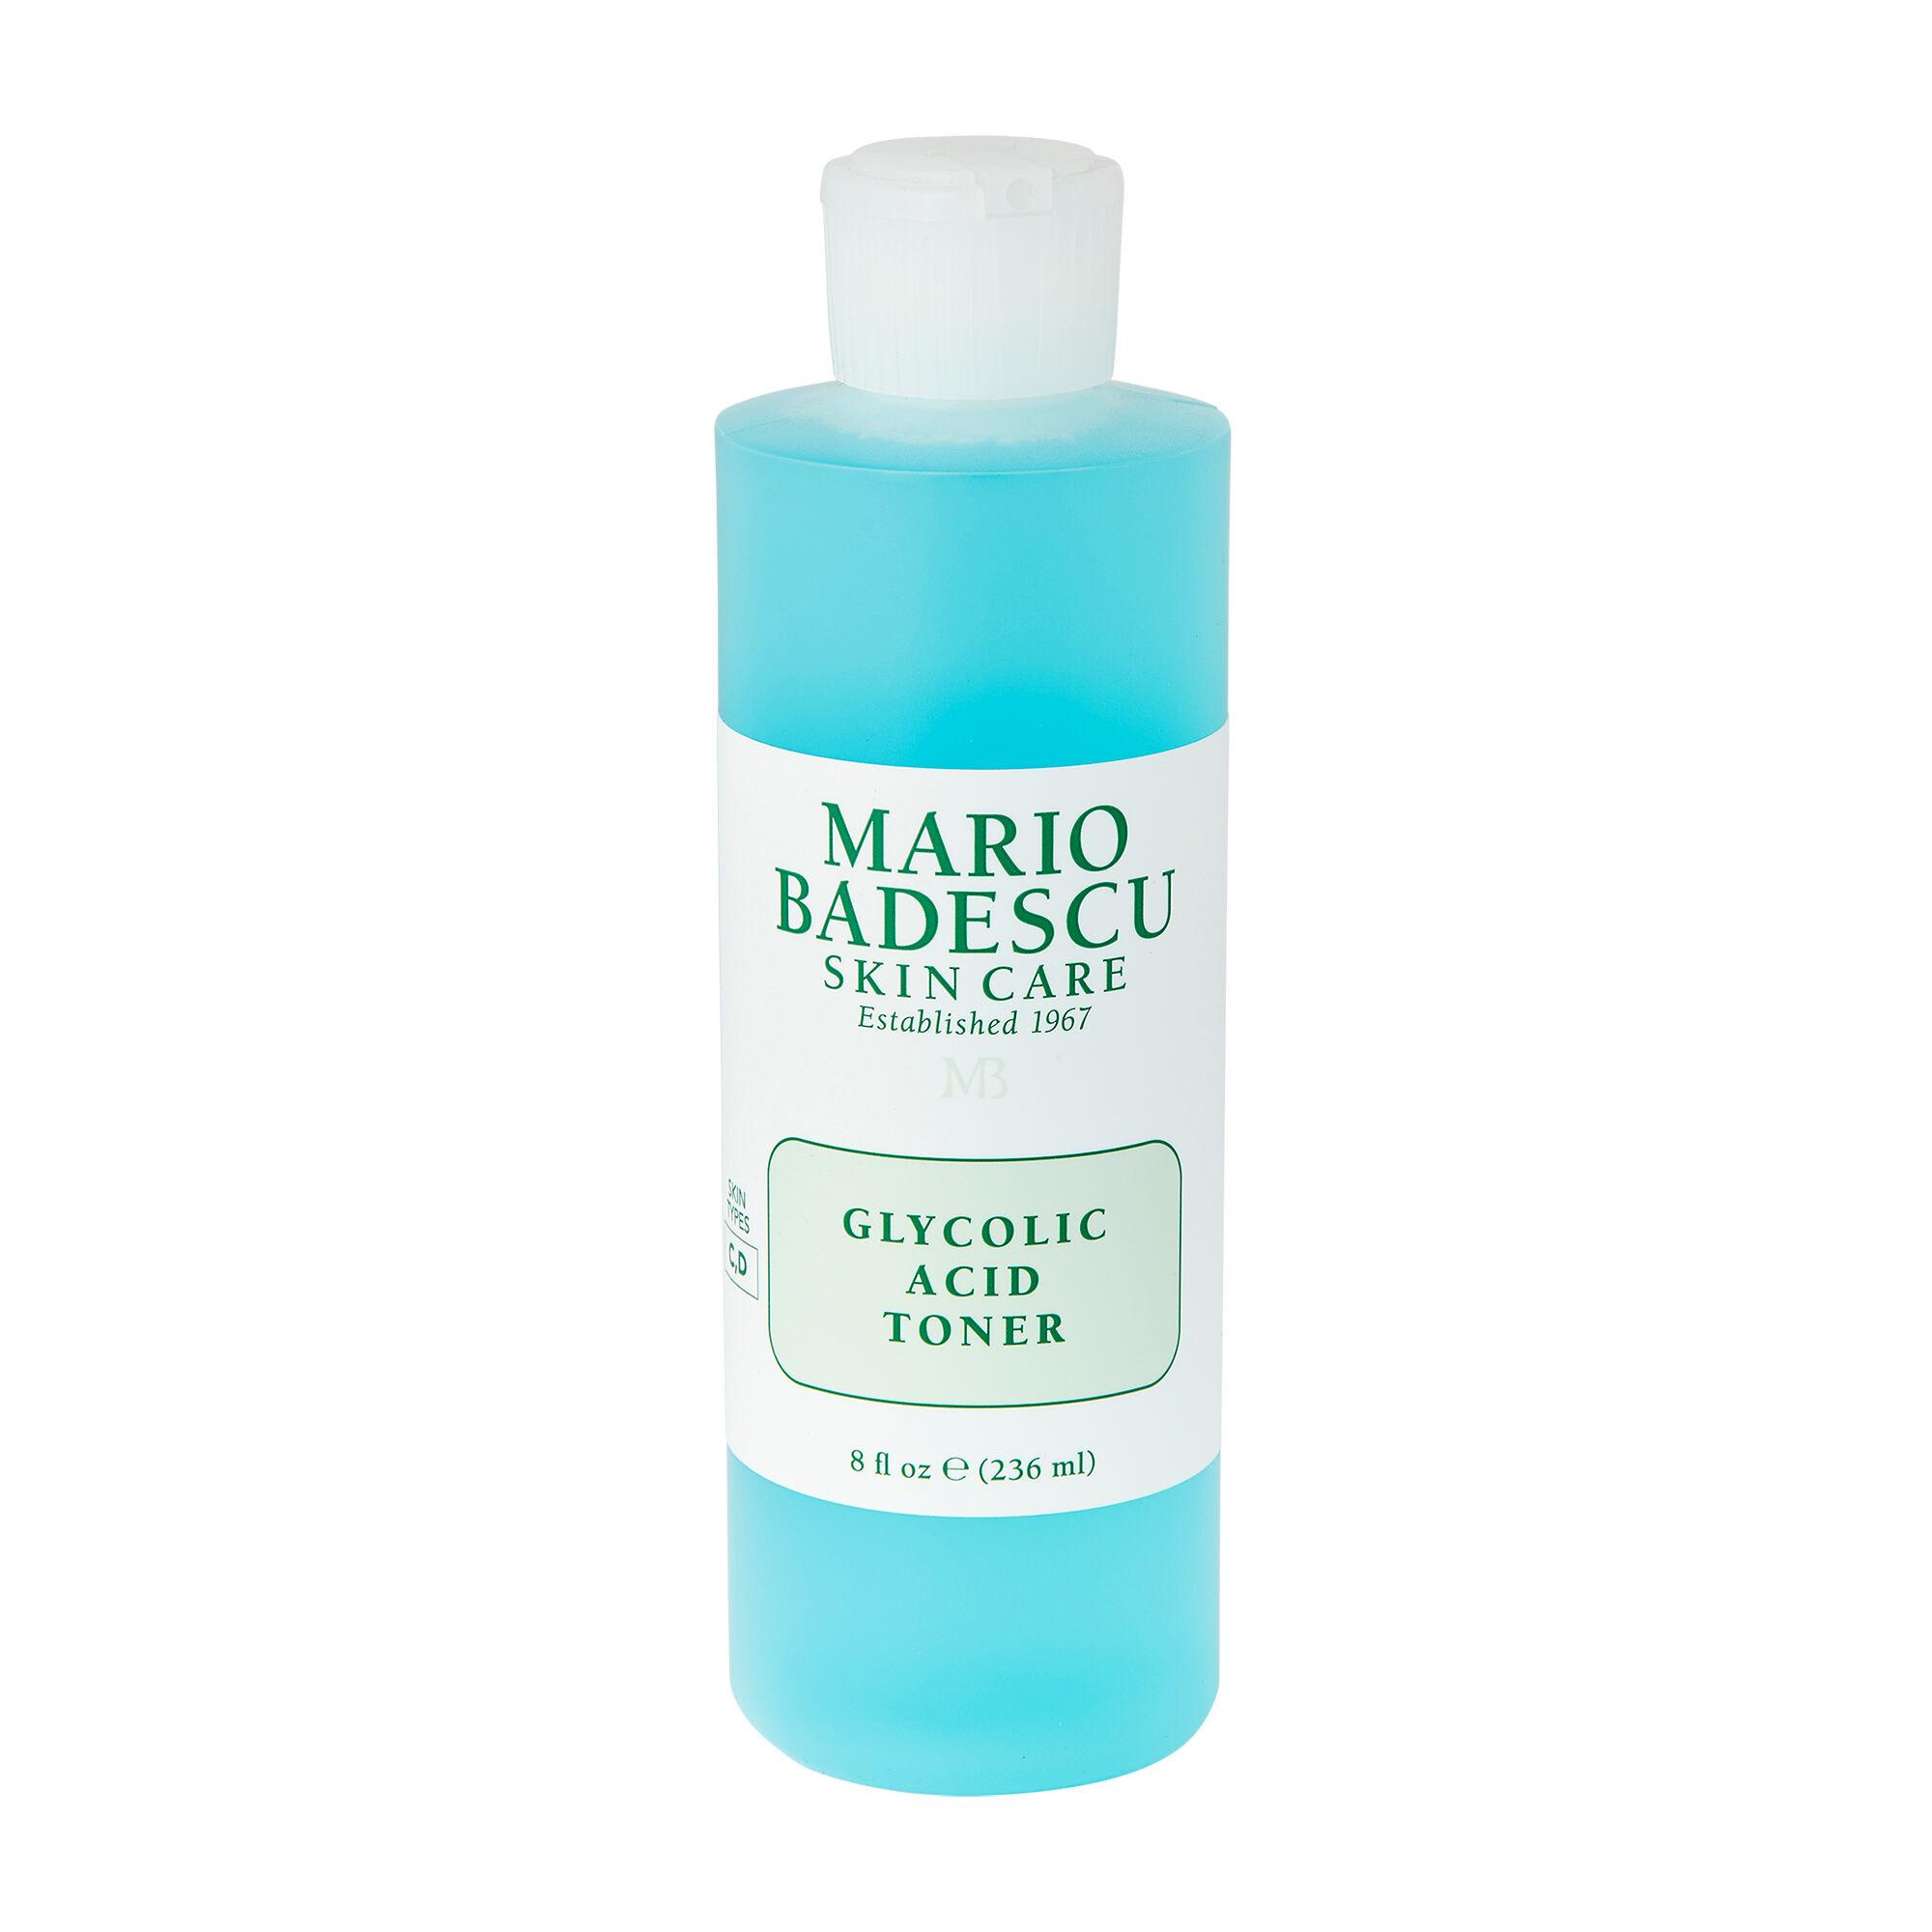 Mario Badescu Lotion tonique lacide glycolique Glycolic Acid Toner 236ml